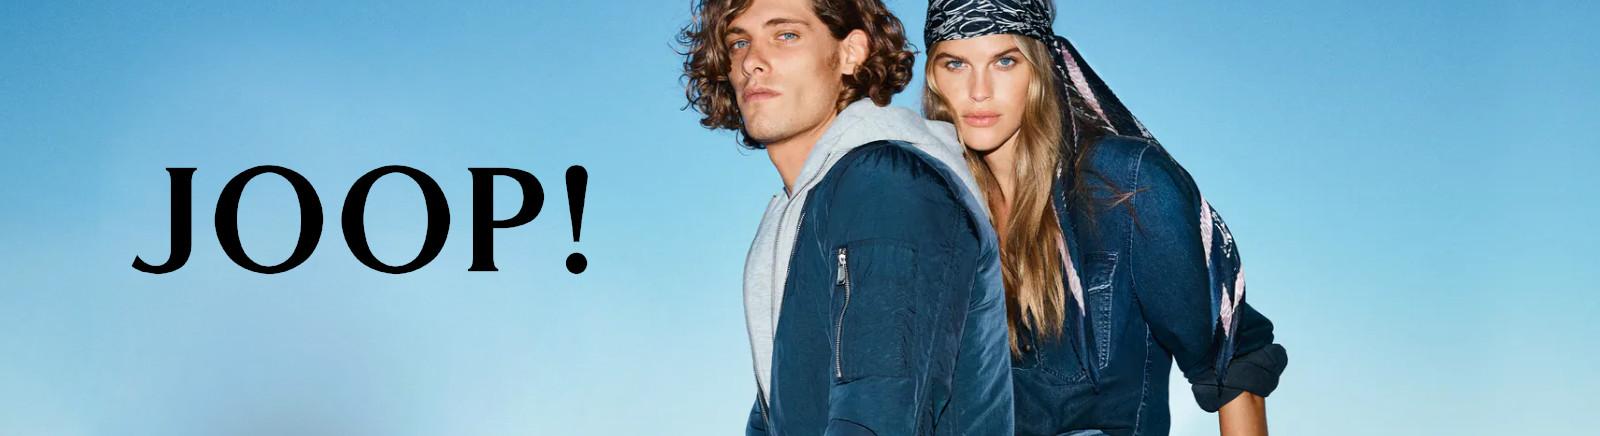 Juppen: Joop Schnürschuhe für Damen online shoppen